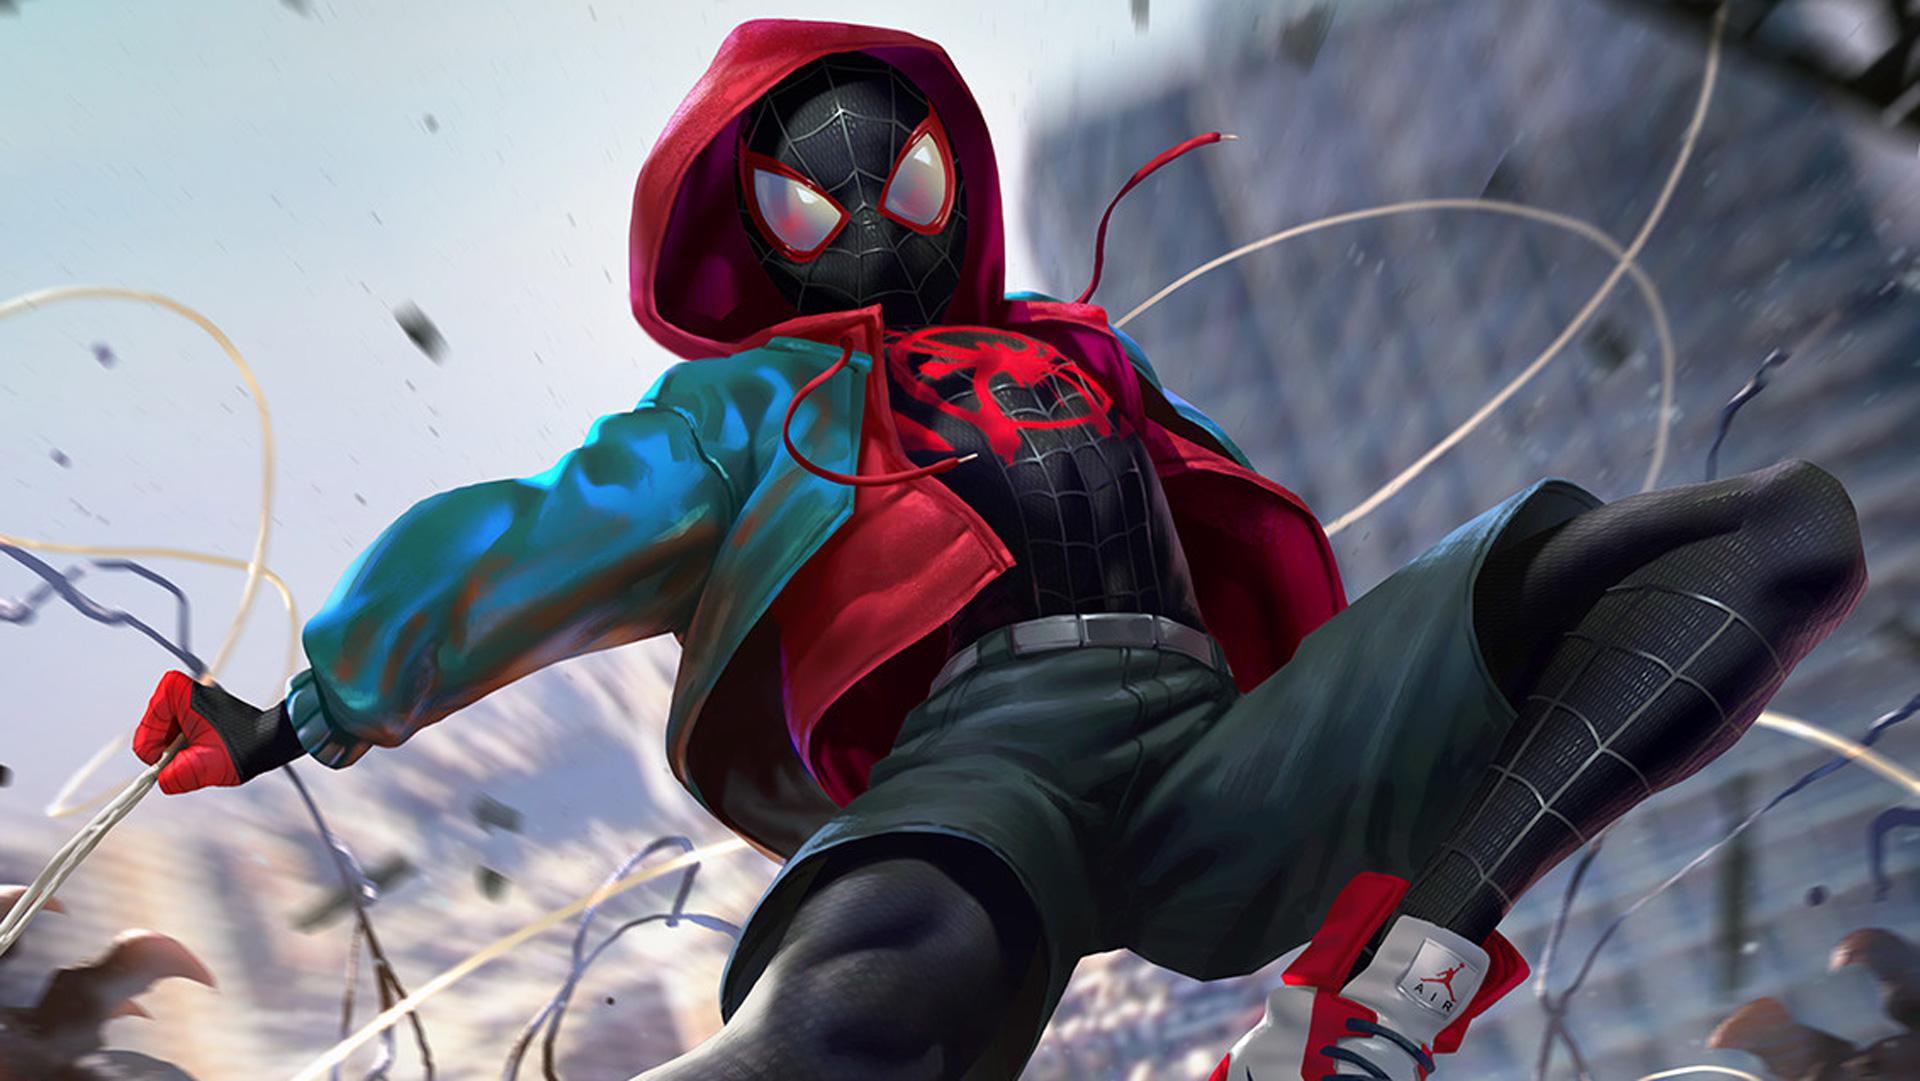 SpiderMan Into The Spider Verse Digital Art 2018, HD